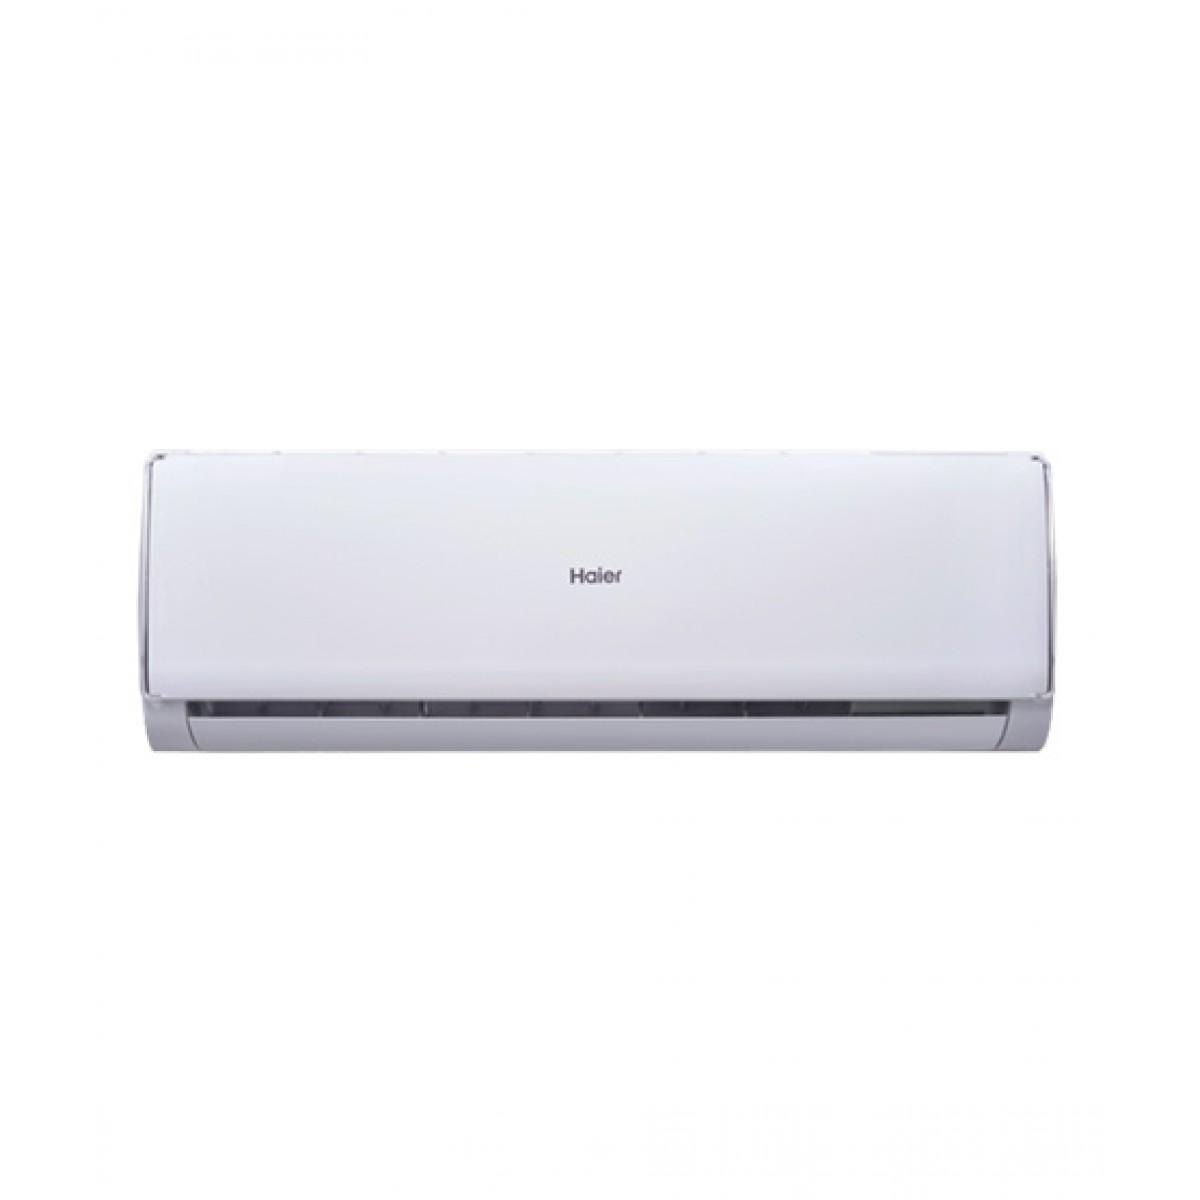 Haier T-Series Split Air Conditioner 1.0 Ton (HSU-12lth-012l-W)